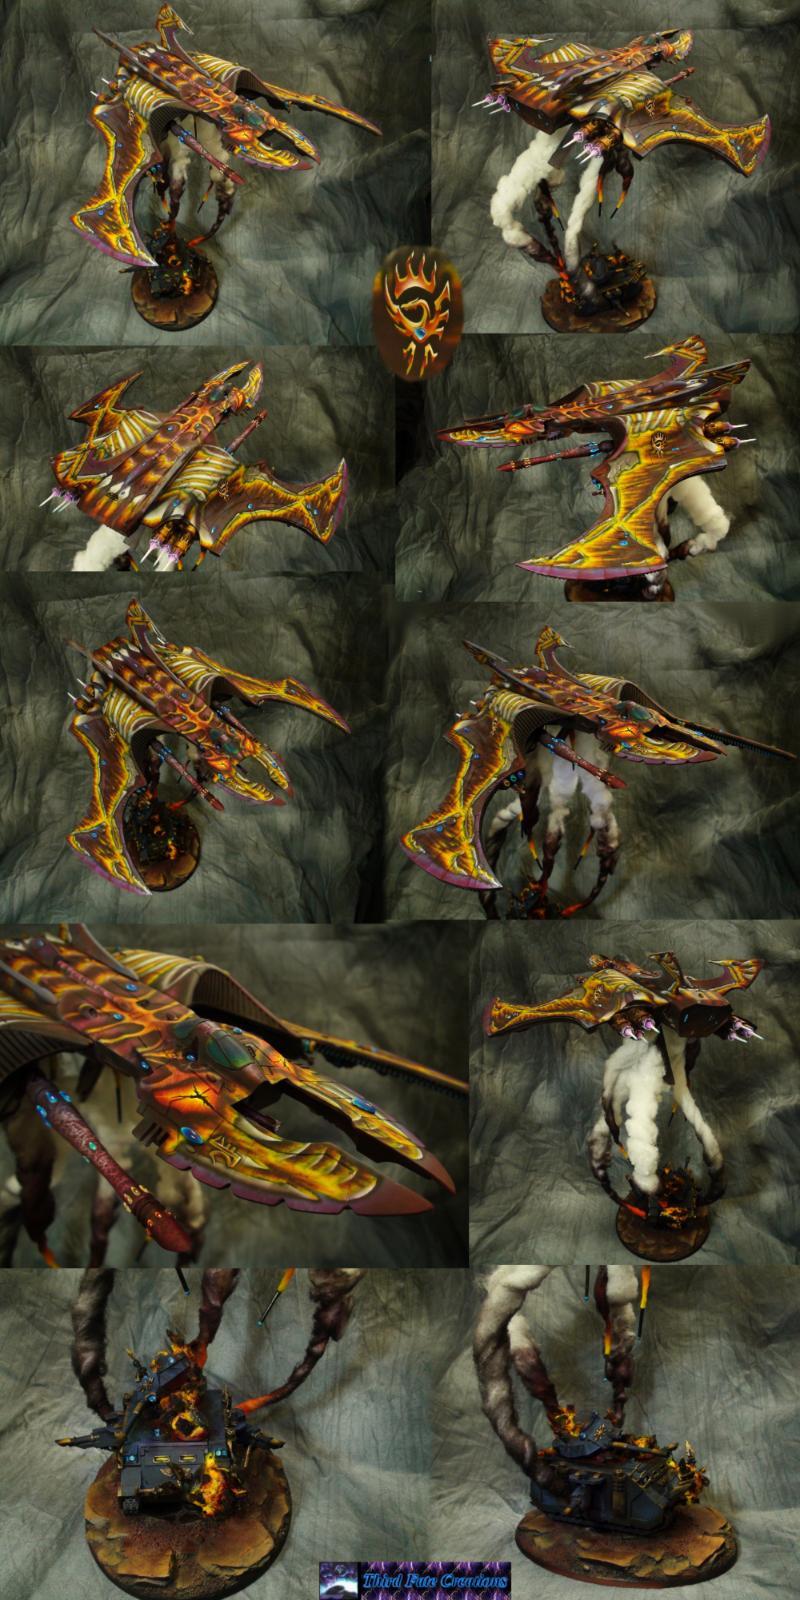 Airbrush, Barrage, Dragon, Eldar, Hunter, Missile, Predator, Thirdfatecreations, Vampire